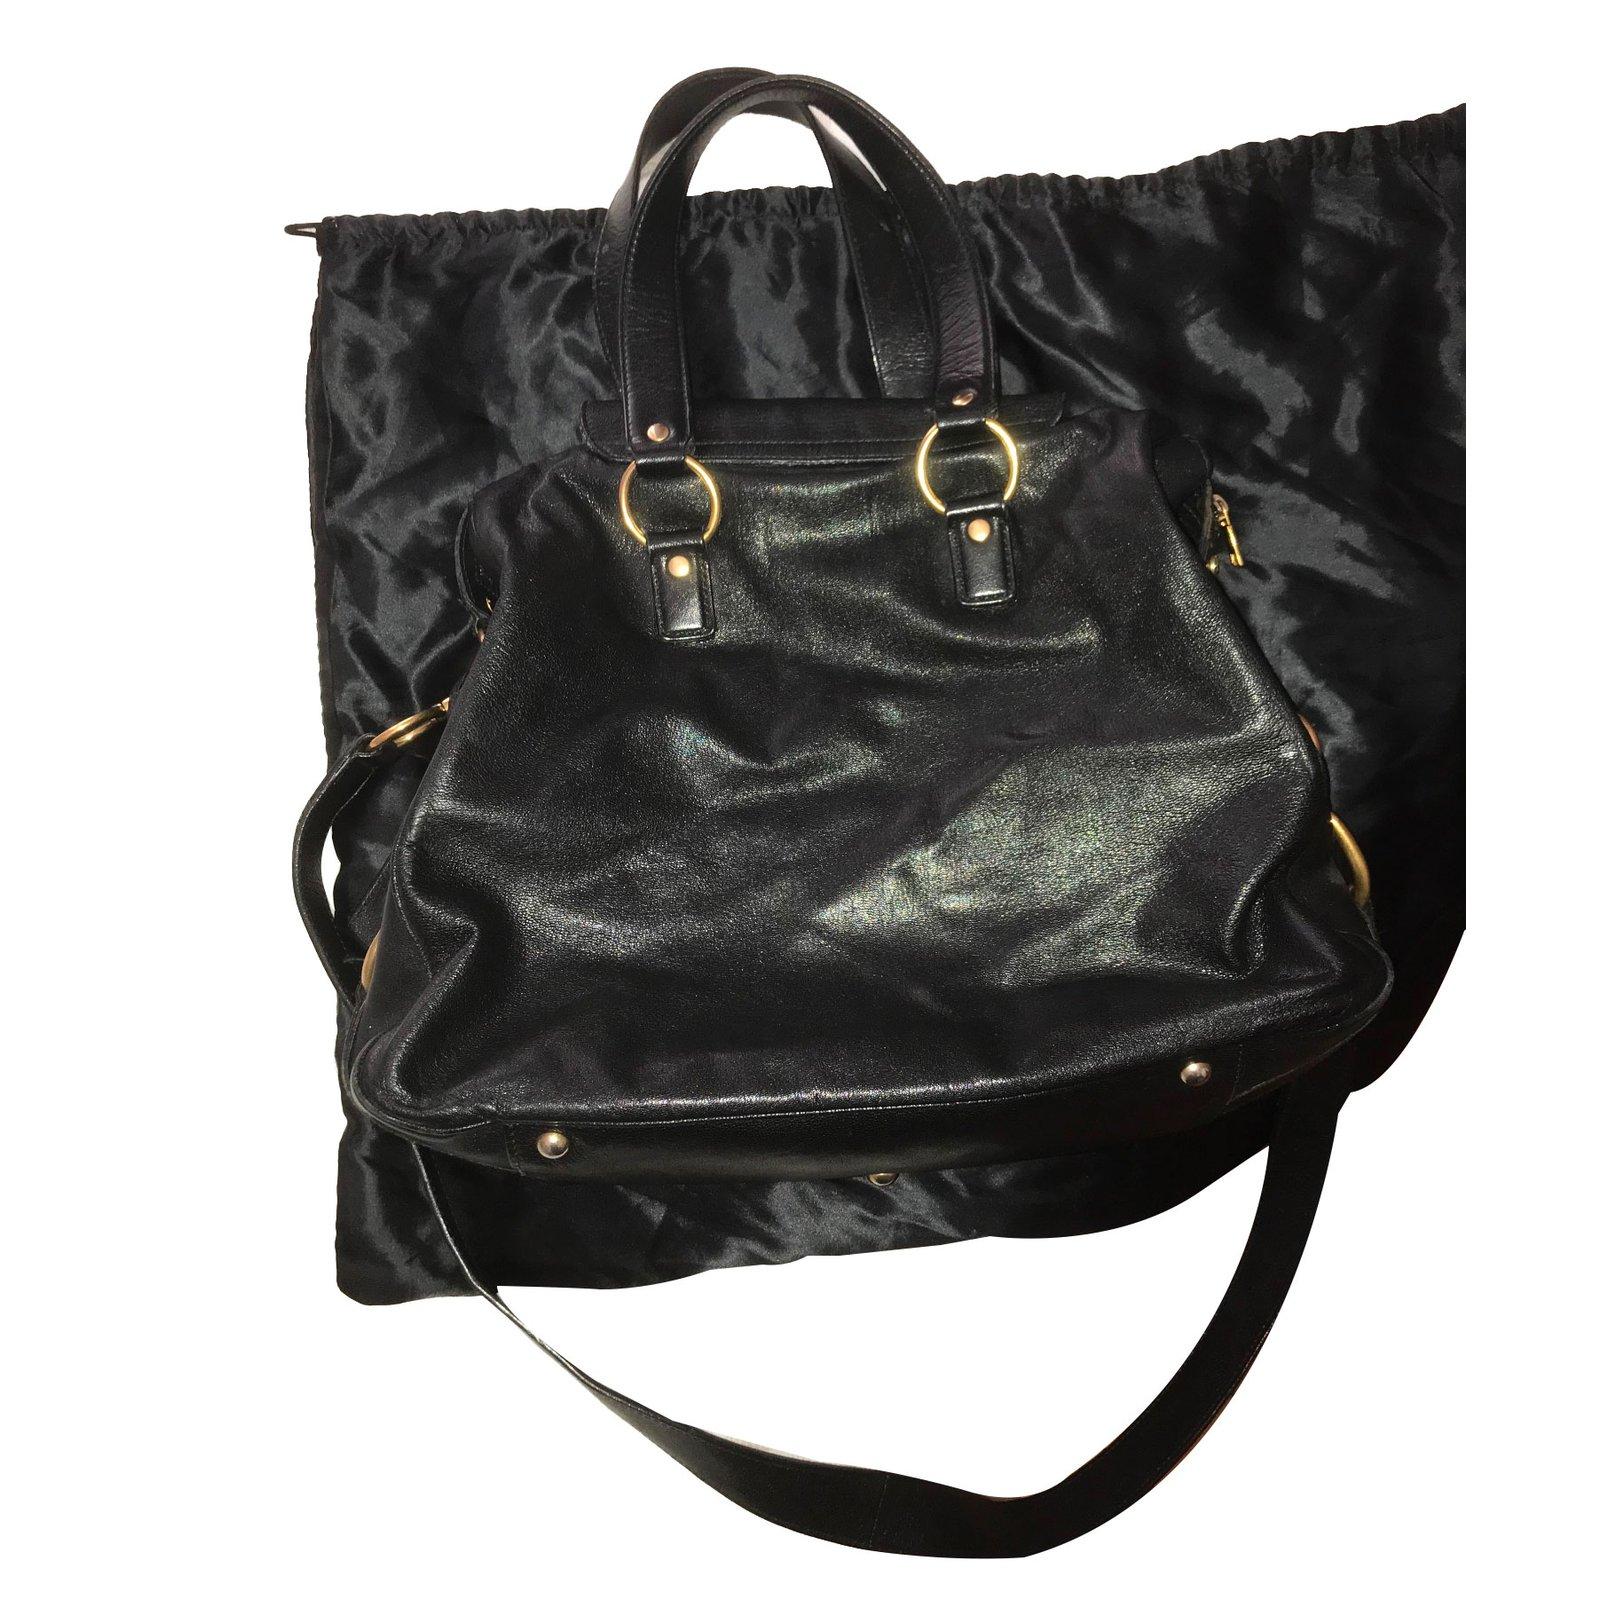 Yves Saint Laurent Handbags Handbags Leather Black ref.75176 - Joli ... 391e70a8dd